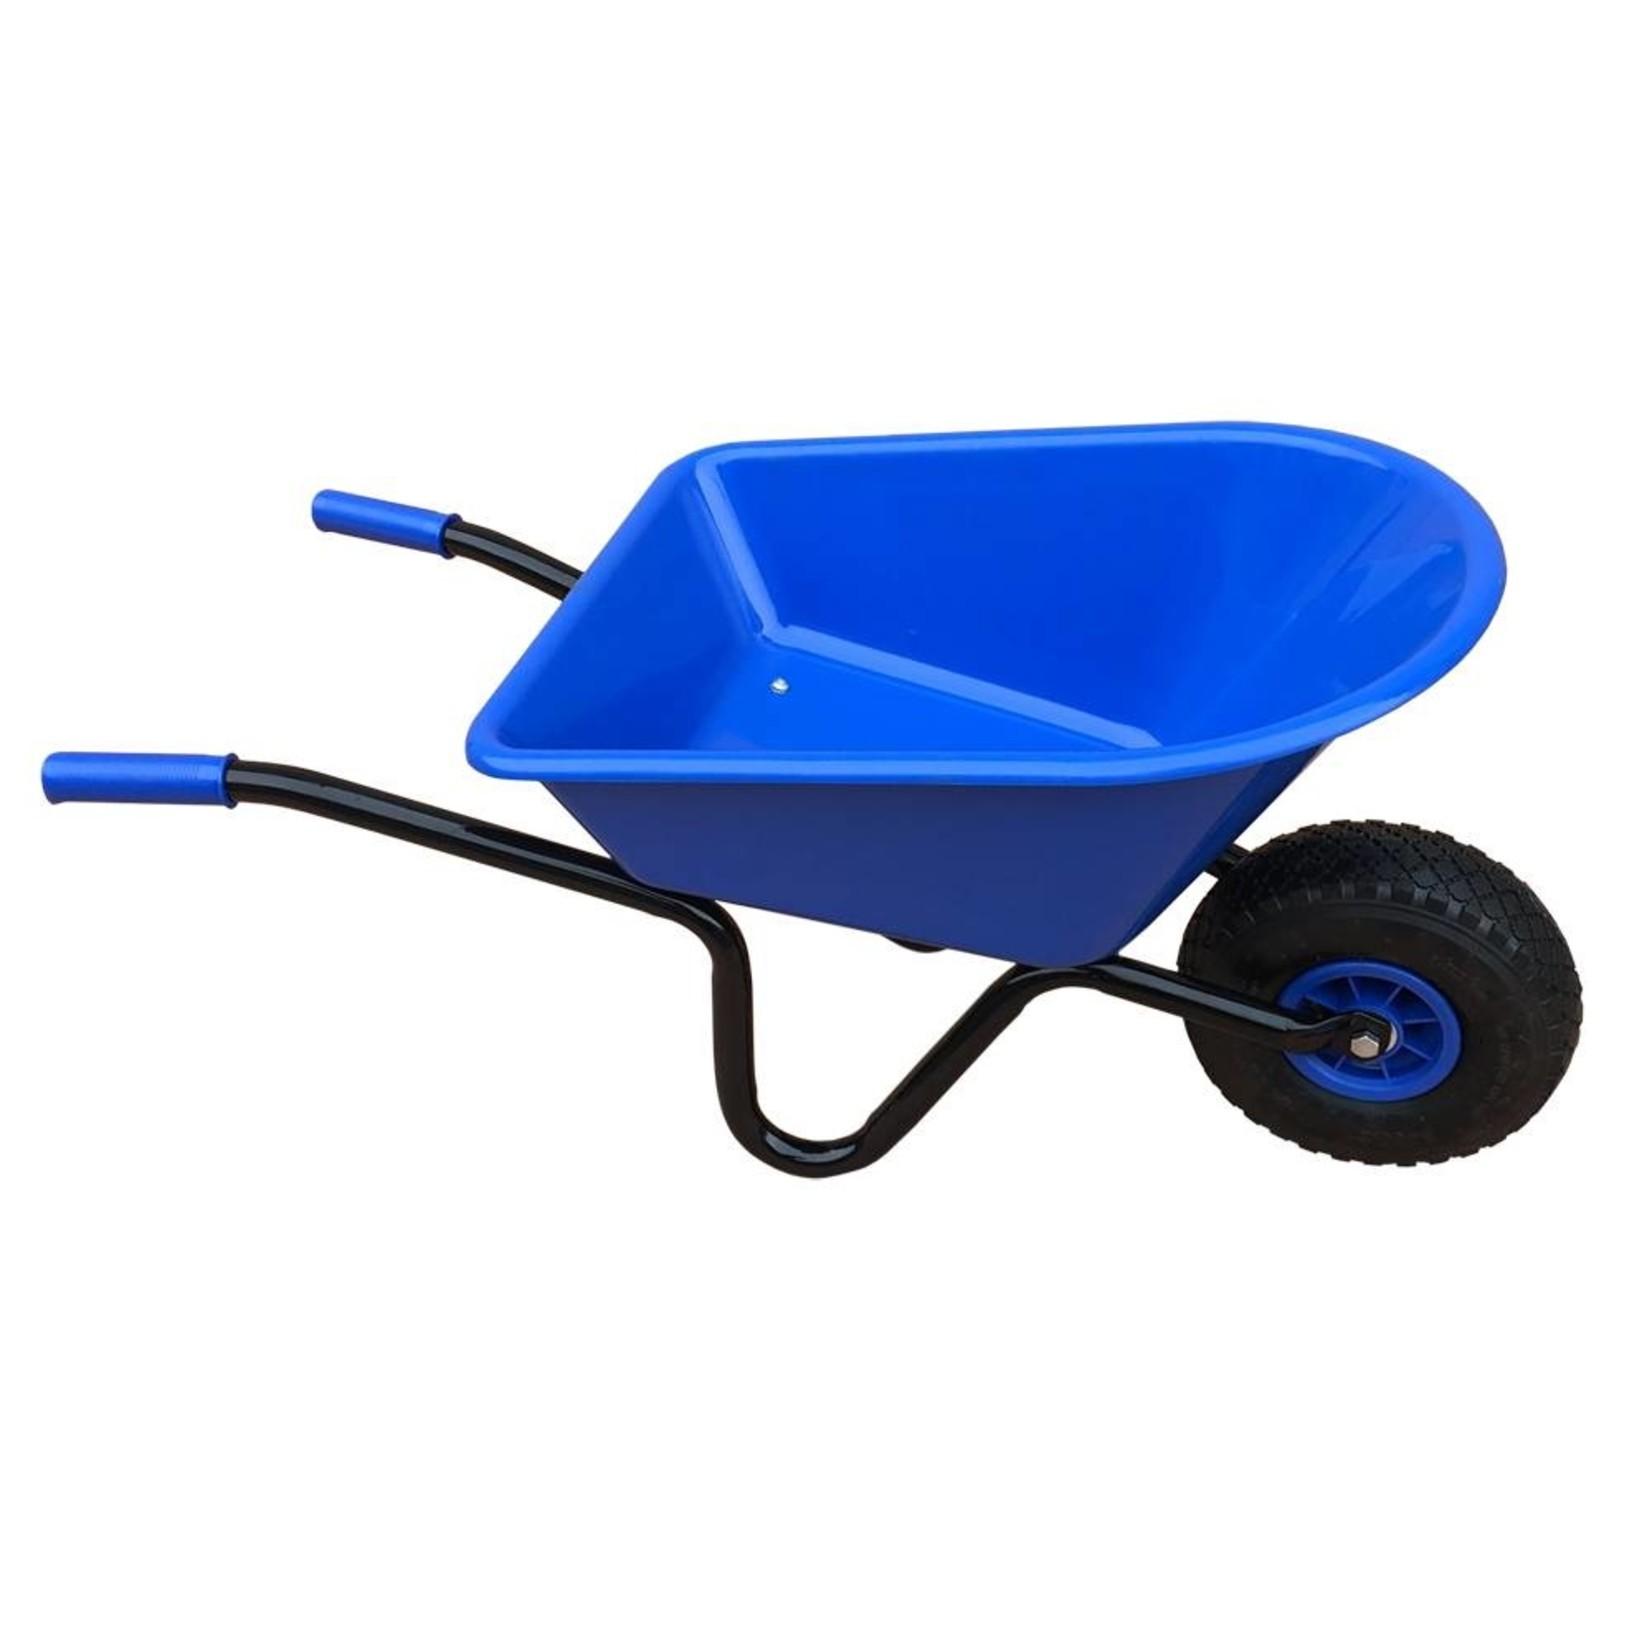 Meuwissen Agro Kinderkruiwagen blauw